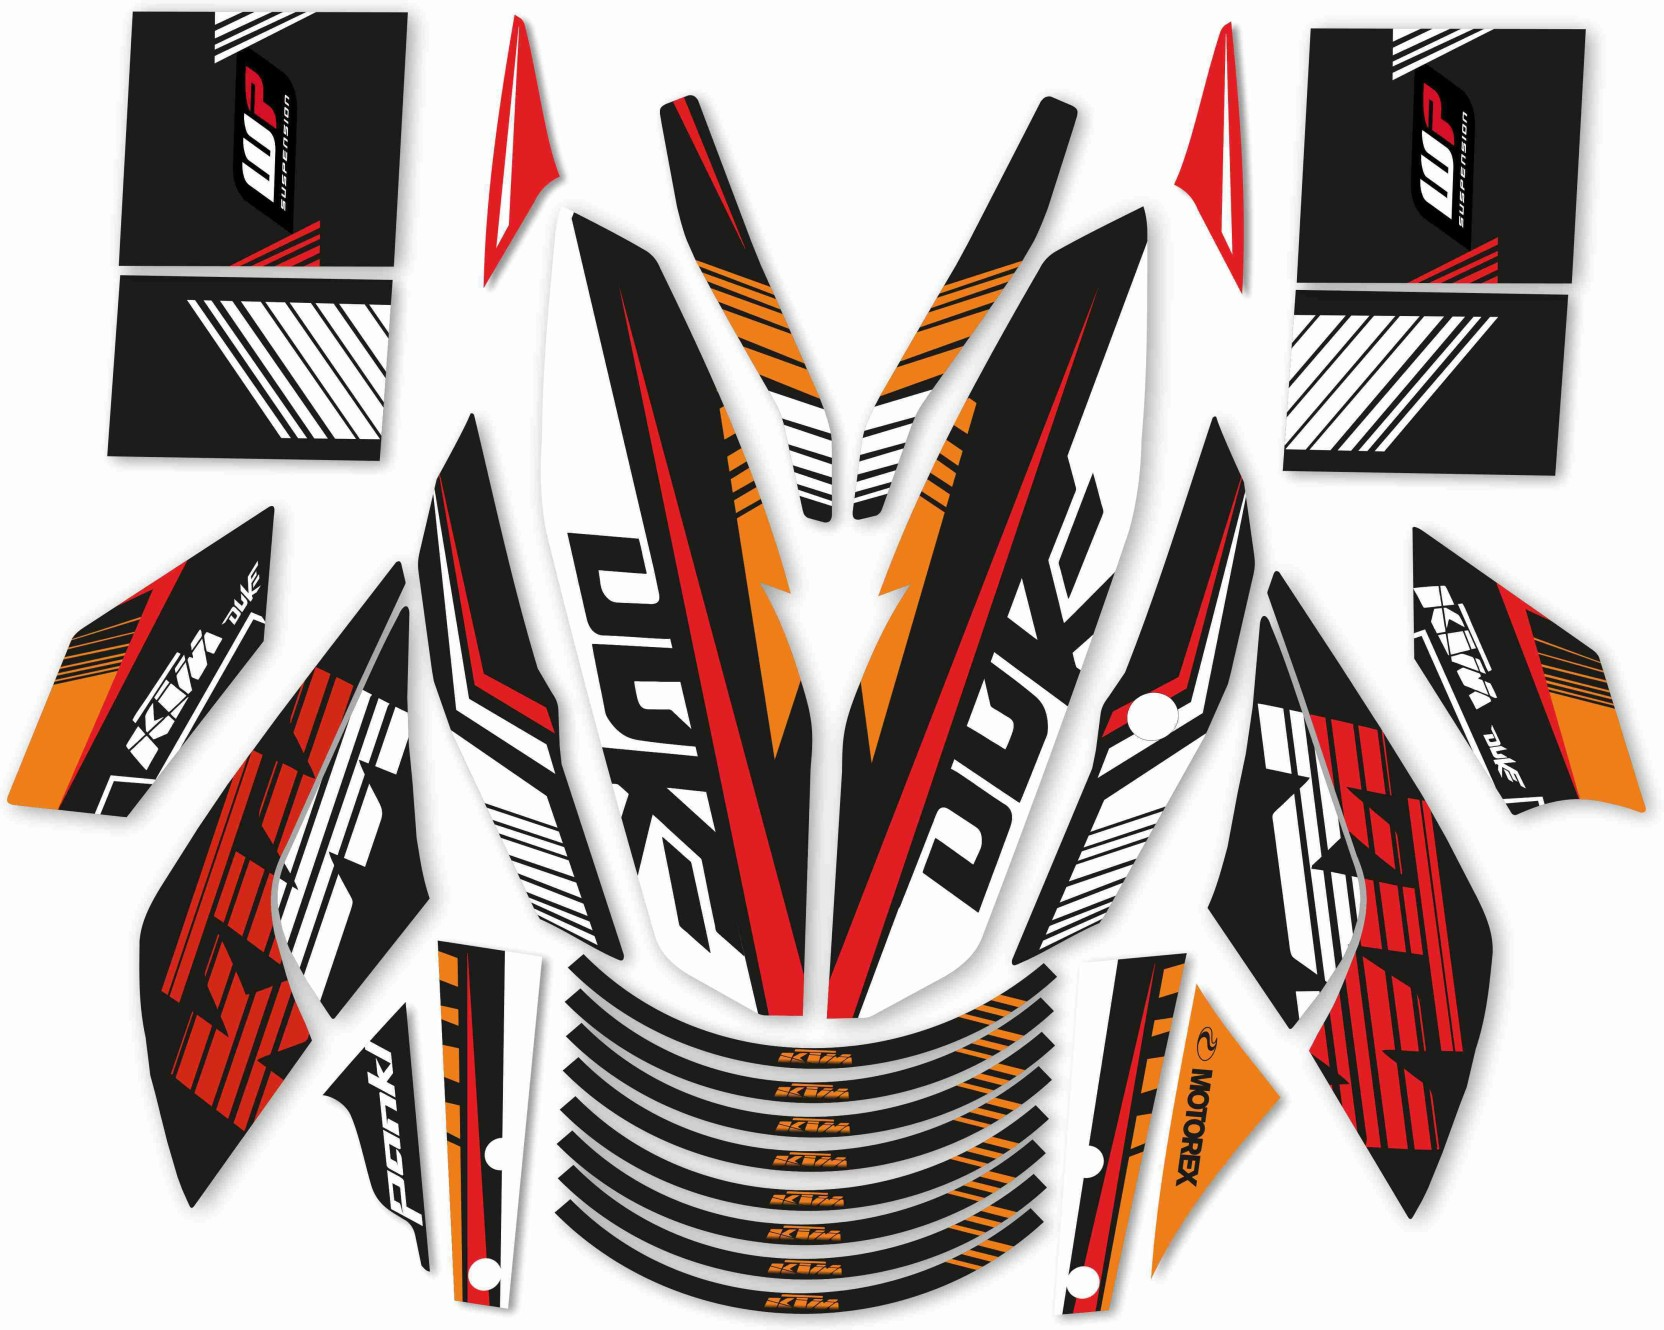 Cr decals designs ktm duke raceline kit motorcycle design sticker pack of 30